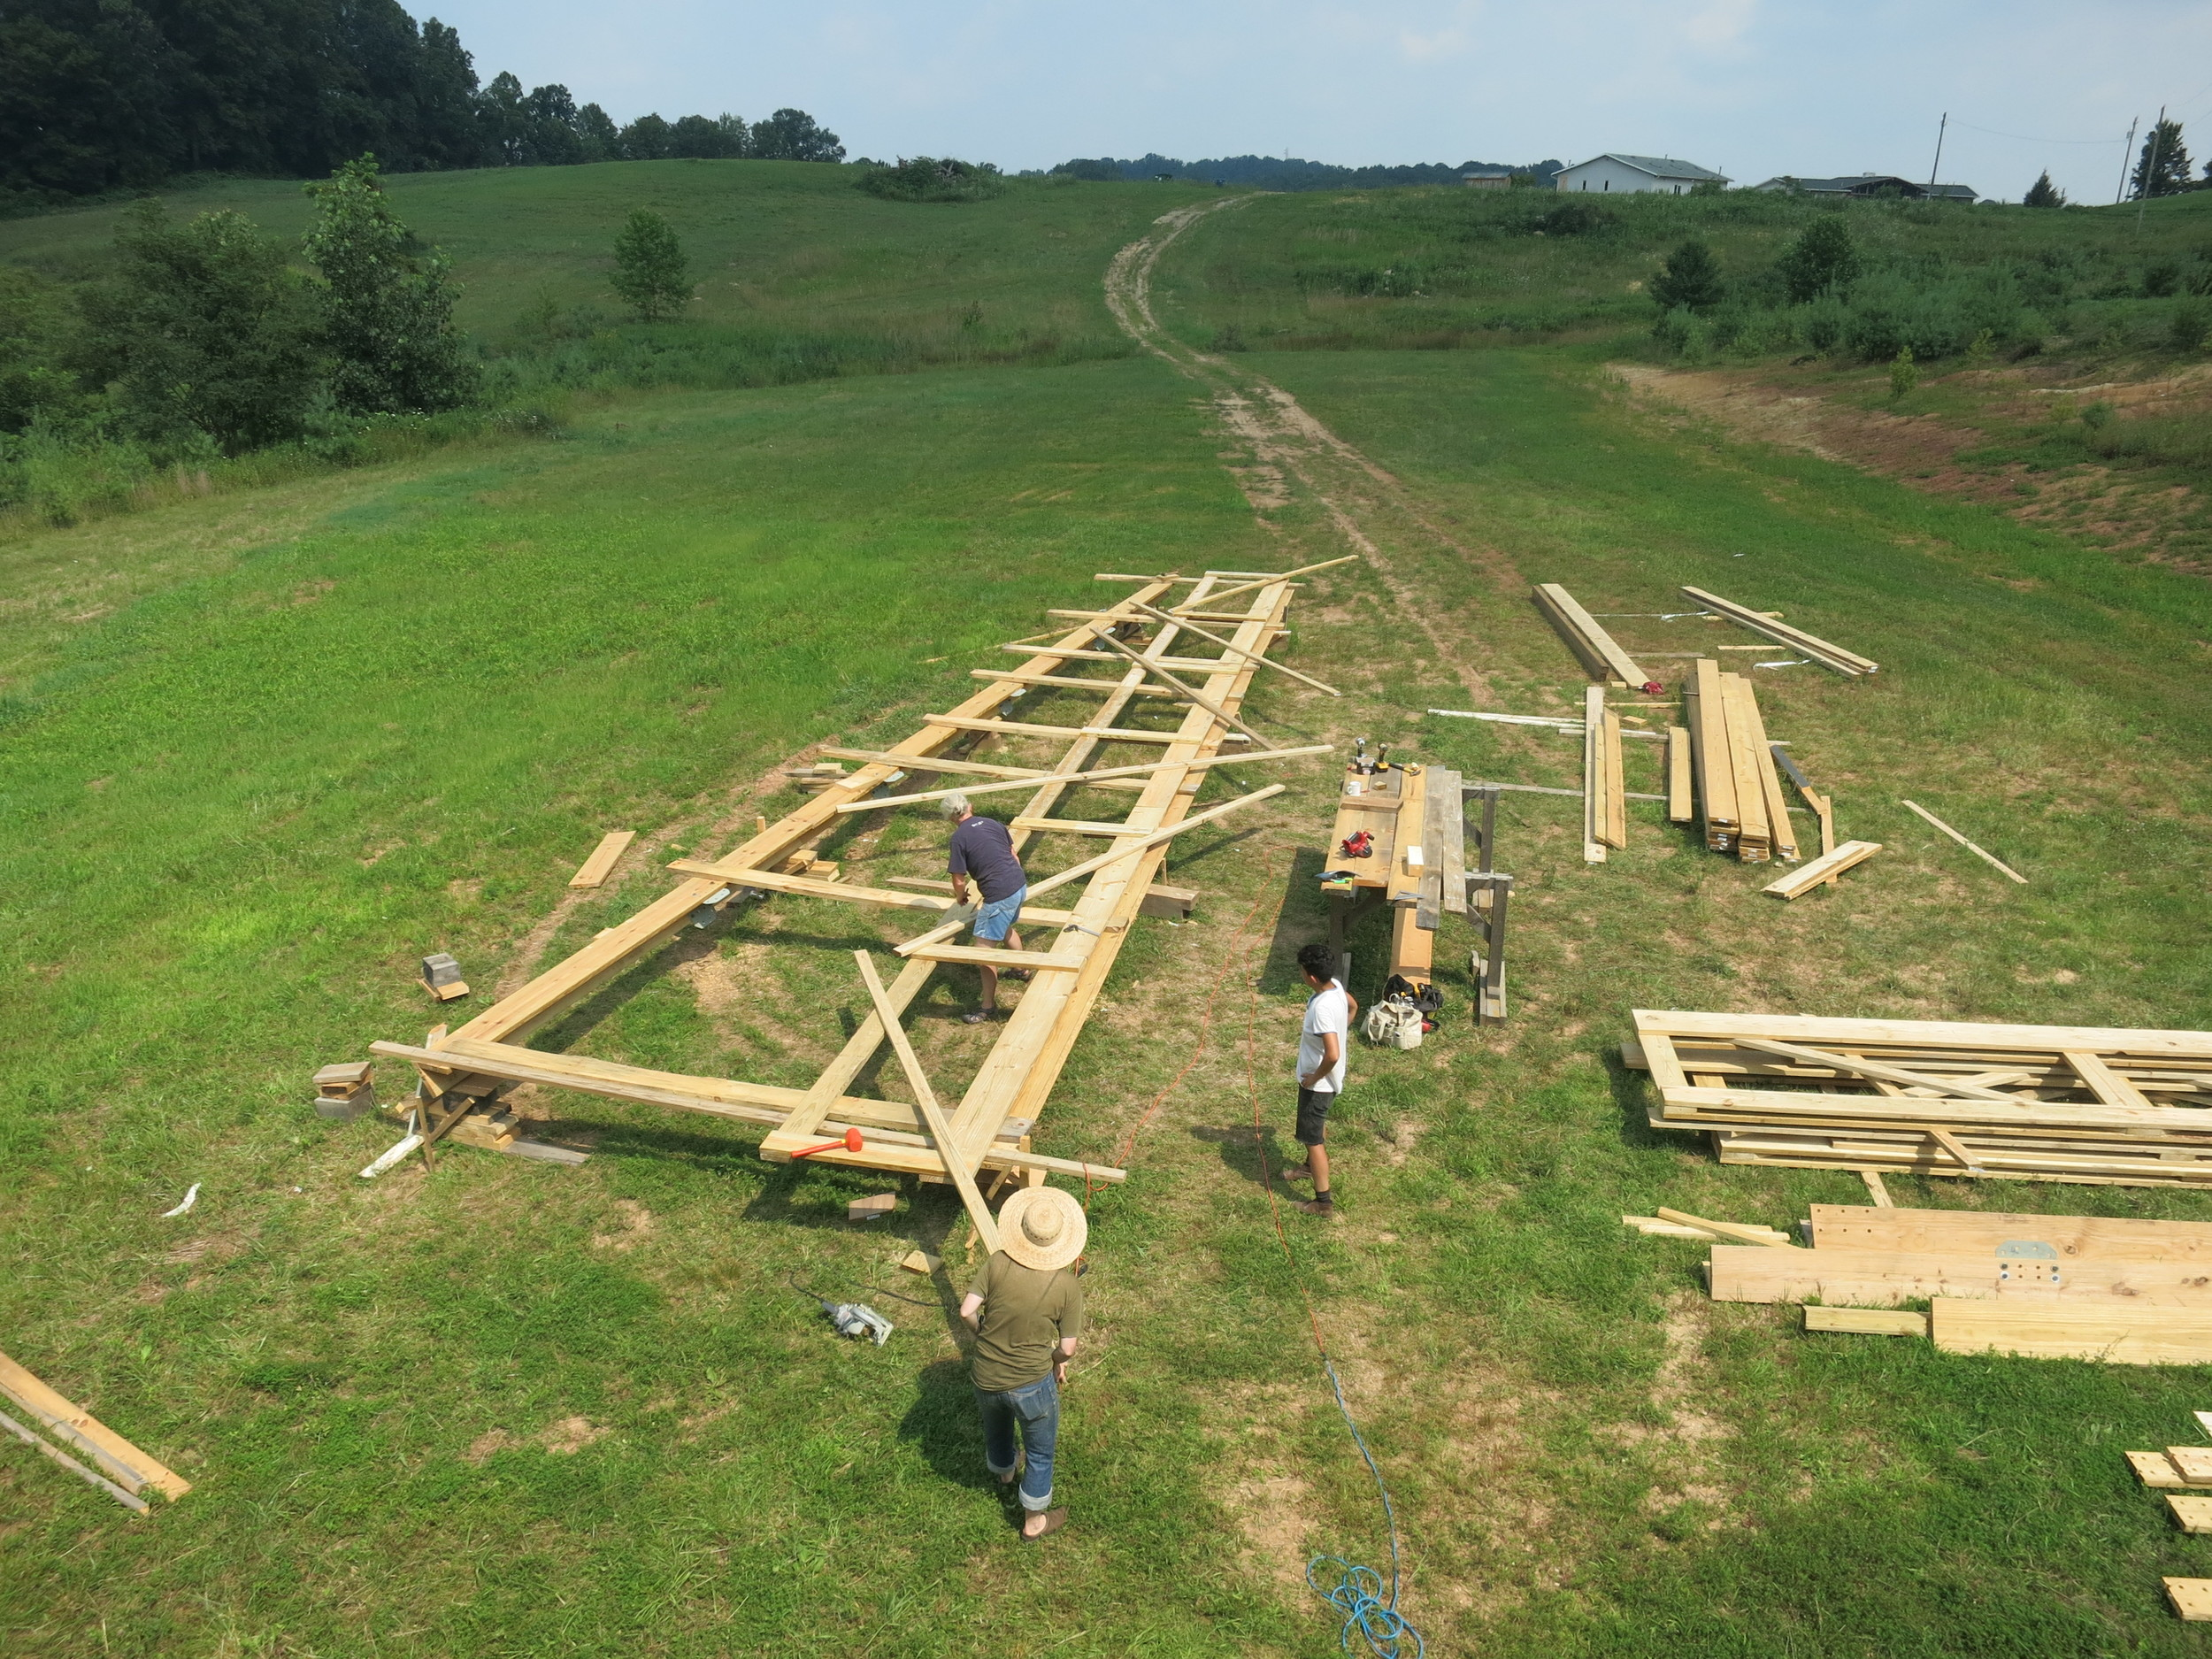 Le Grand Dehors  pre-fabrication, Harold Arts, Ohio 2013